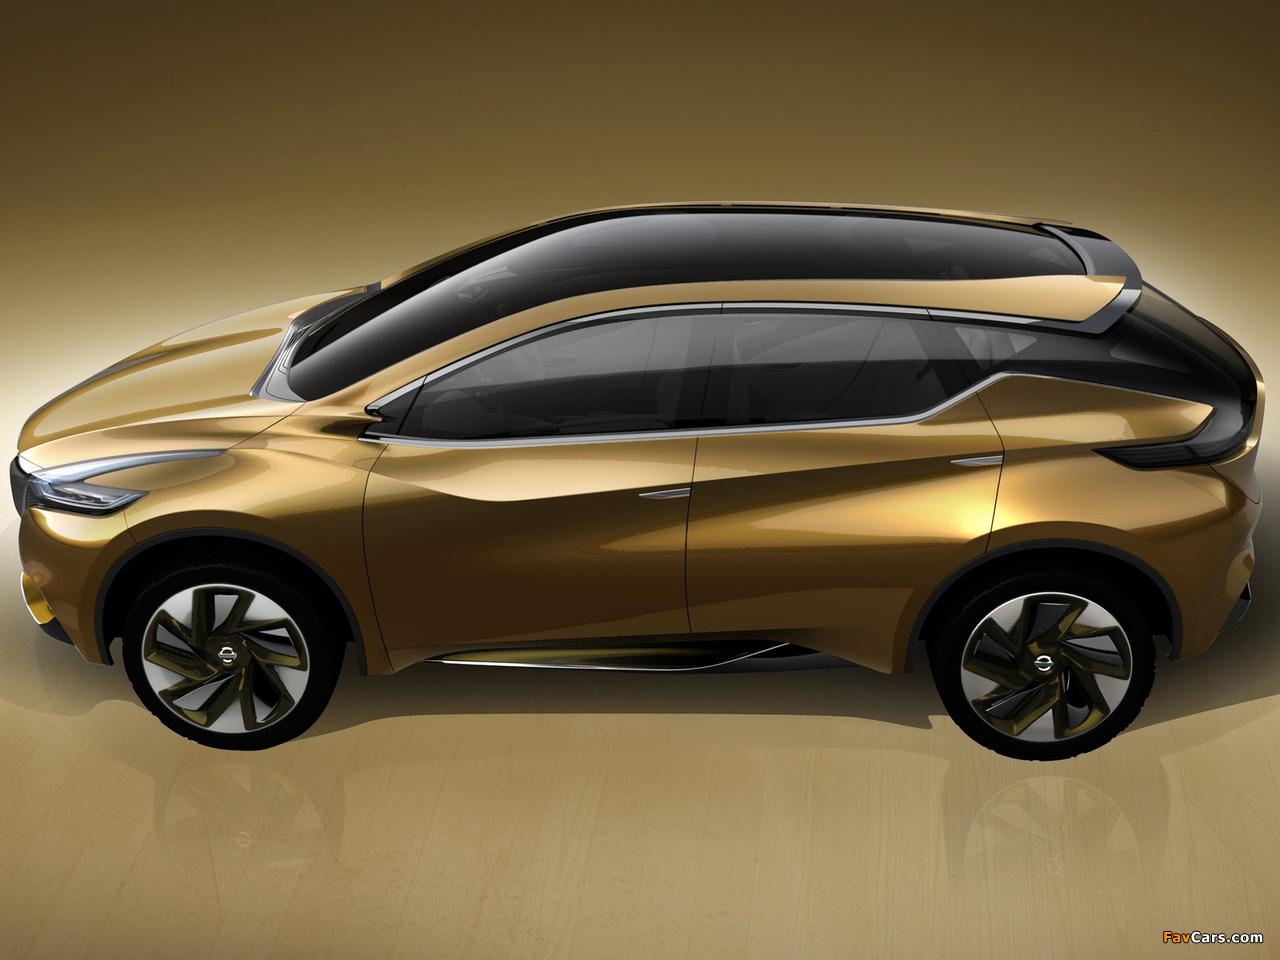 Nissan Resonance Concept 2013 photos (1280 x 960)